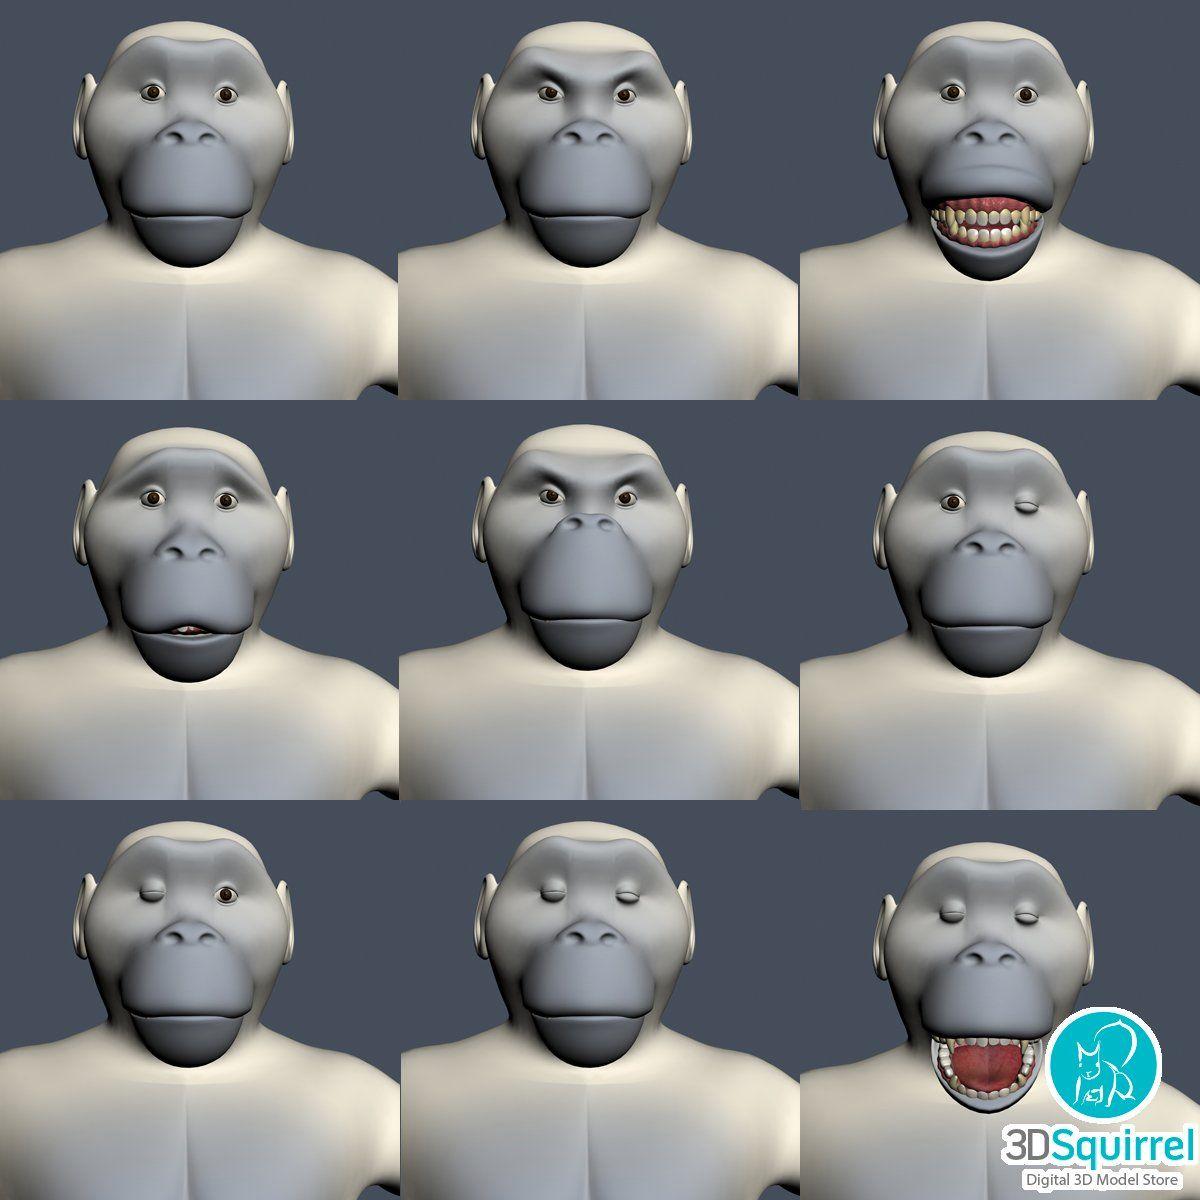 Yeti Character Rigged 3D Model fbx obj max 3ds   3DSquirrel